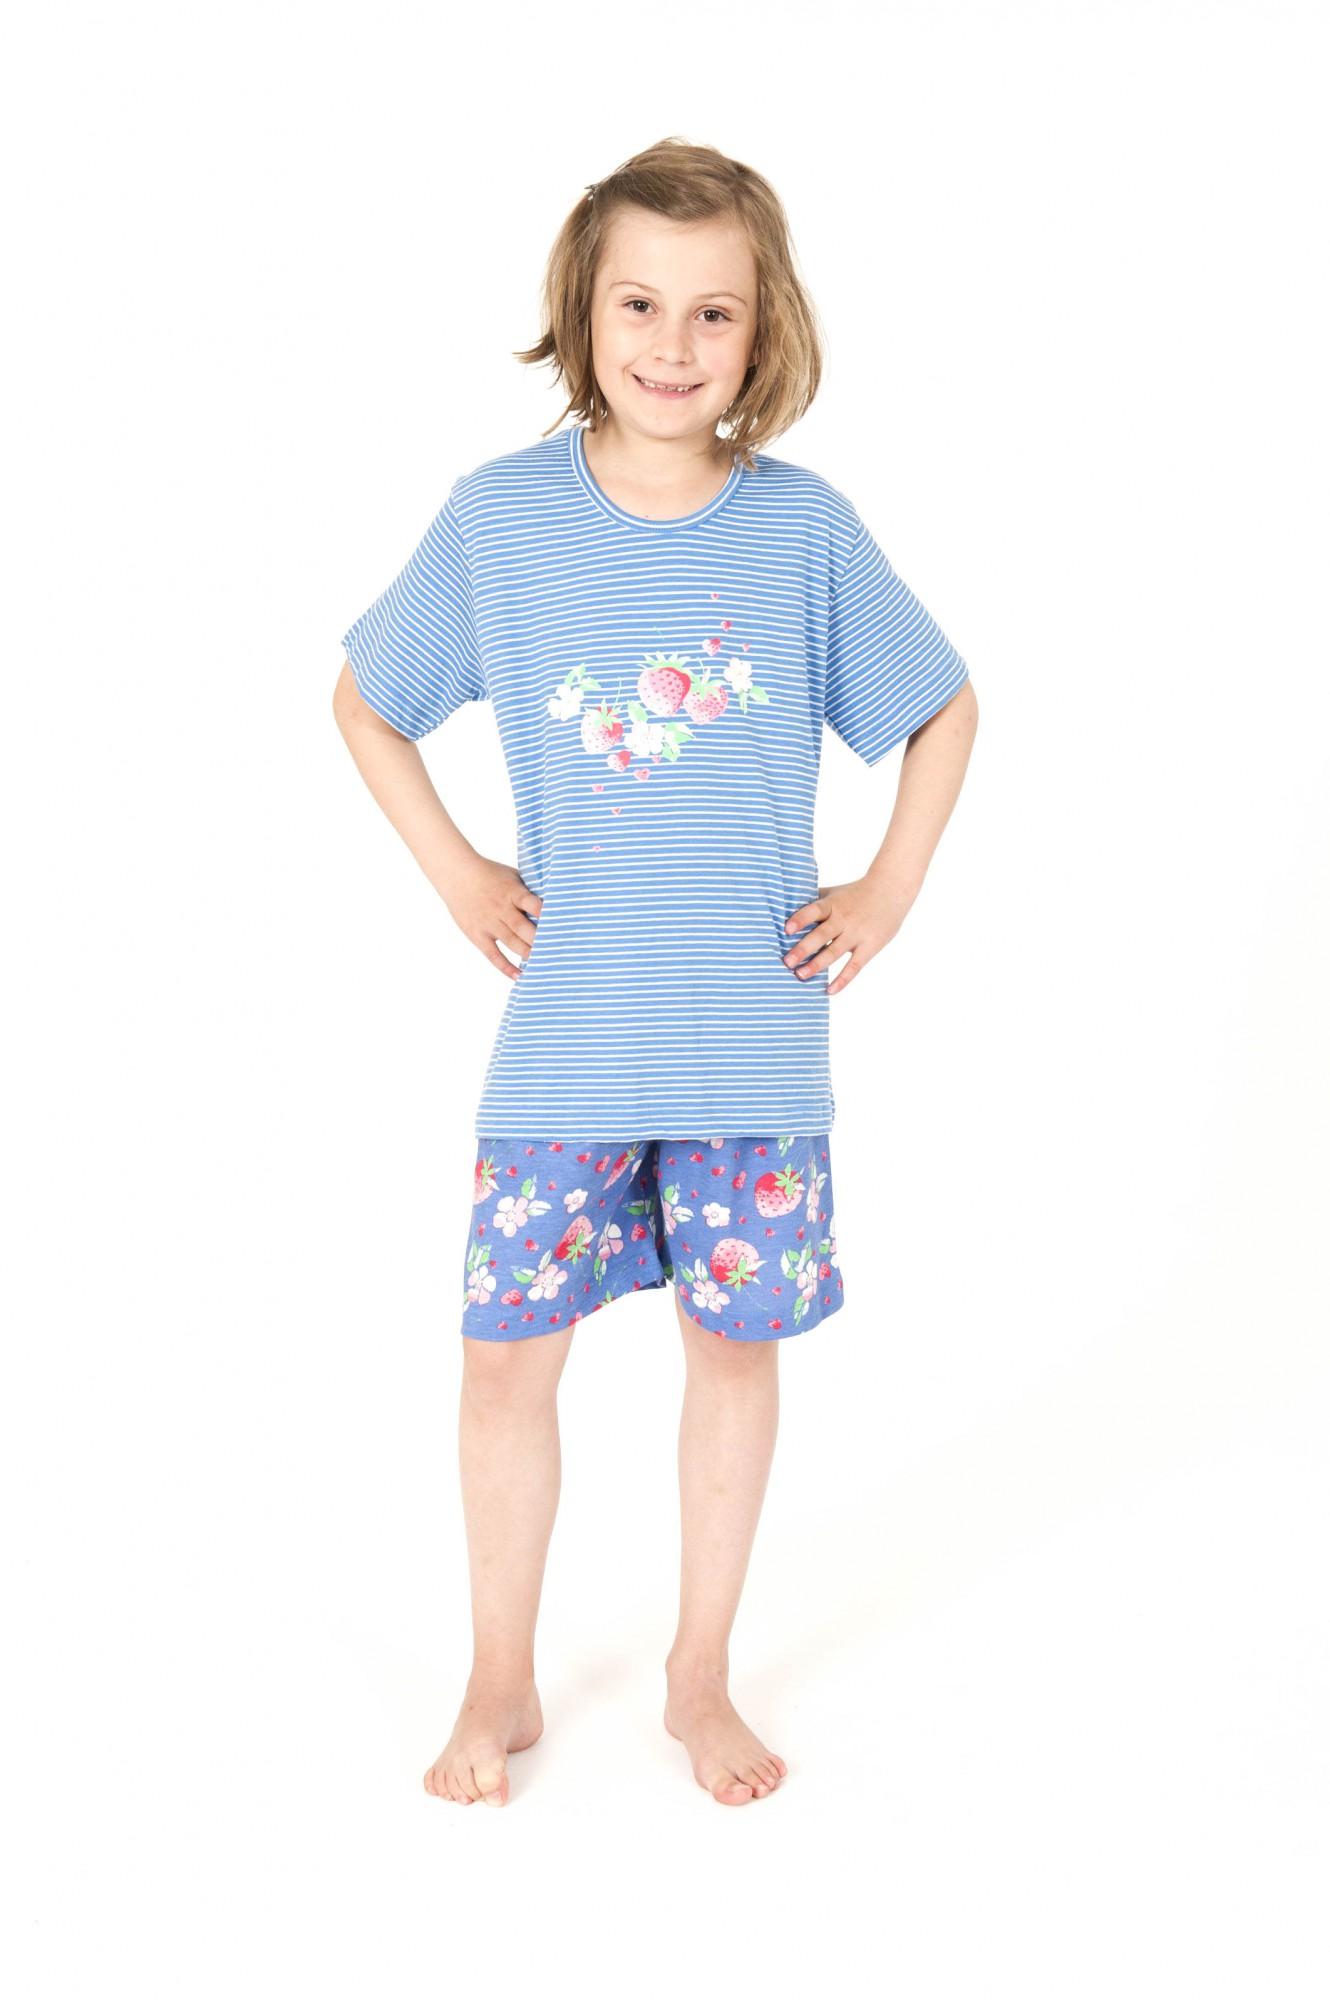 Cooler Mädchen Pyjama kurzarm gestreift – 161 405 90 838 – Bild 1